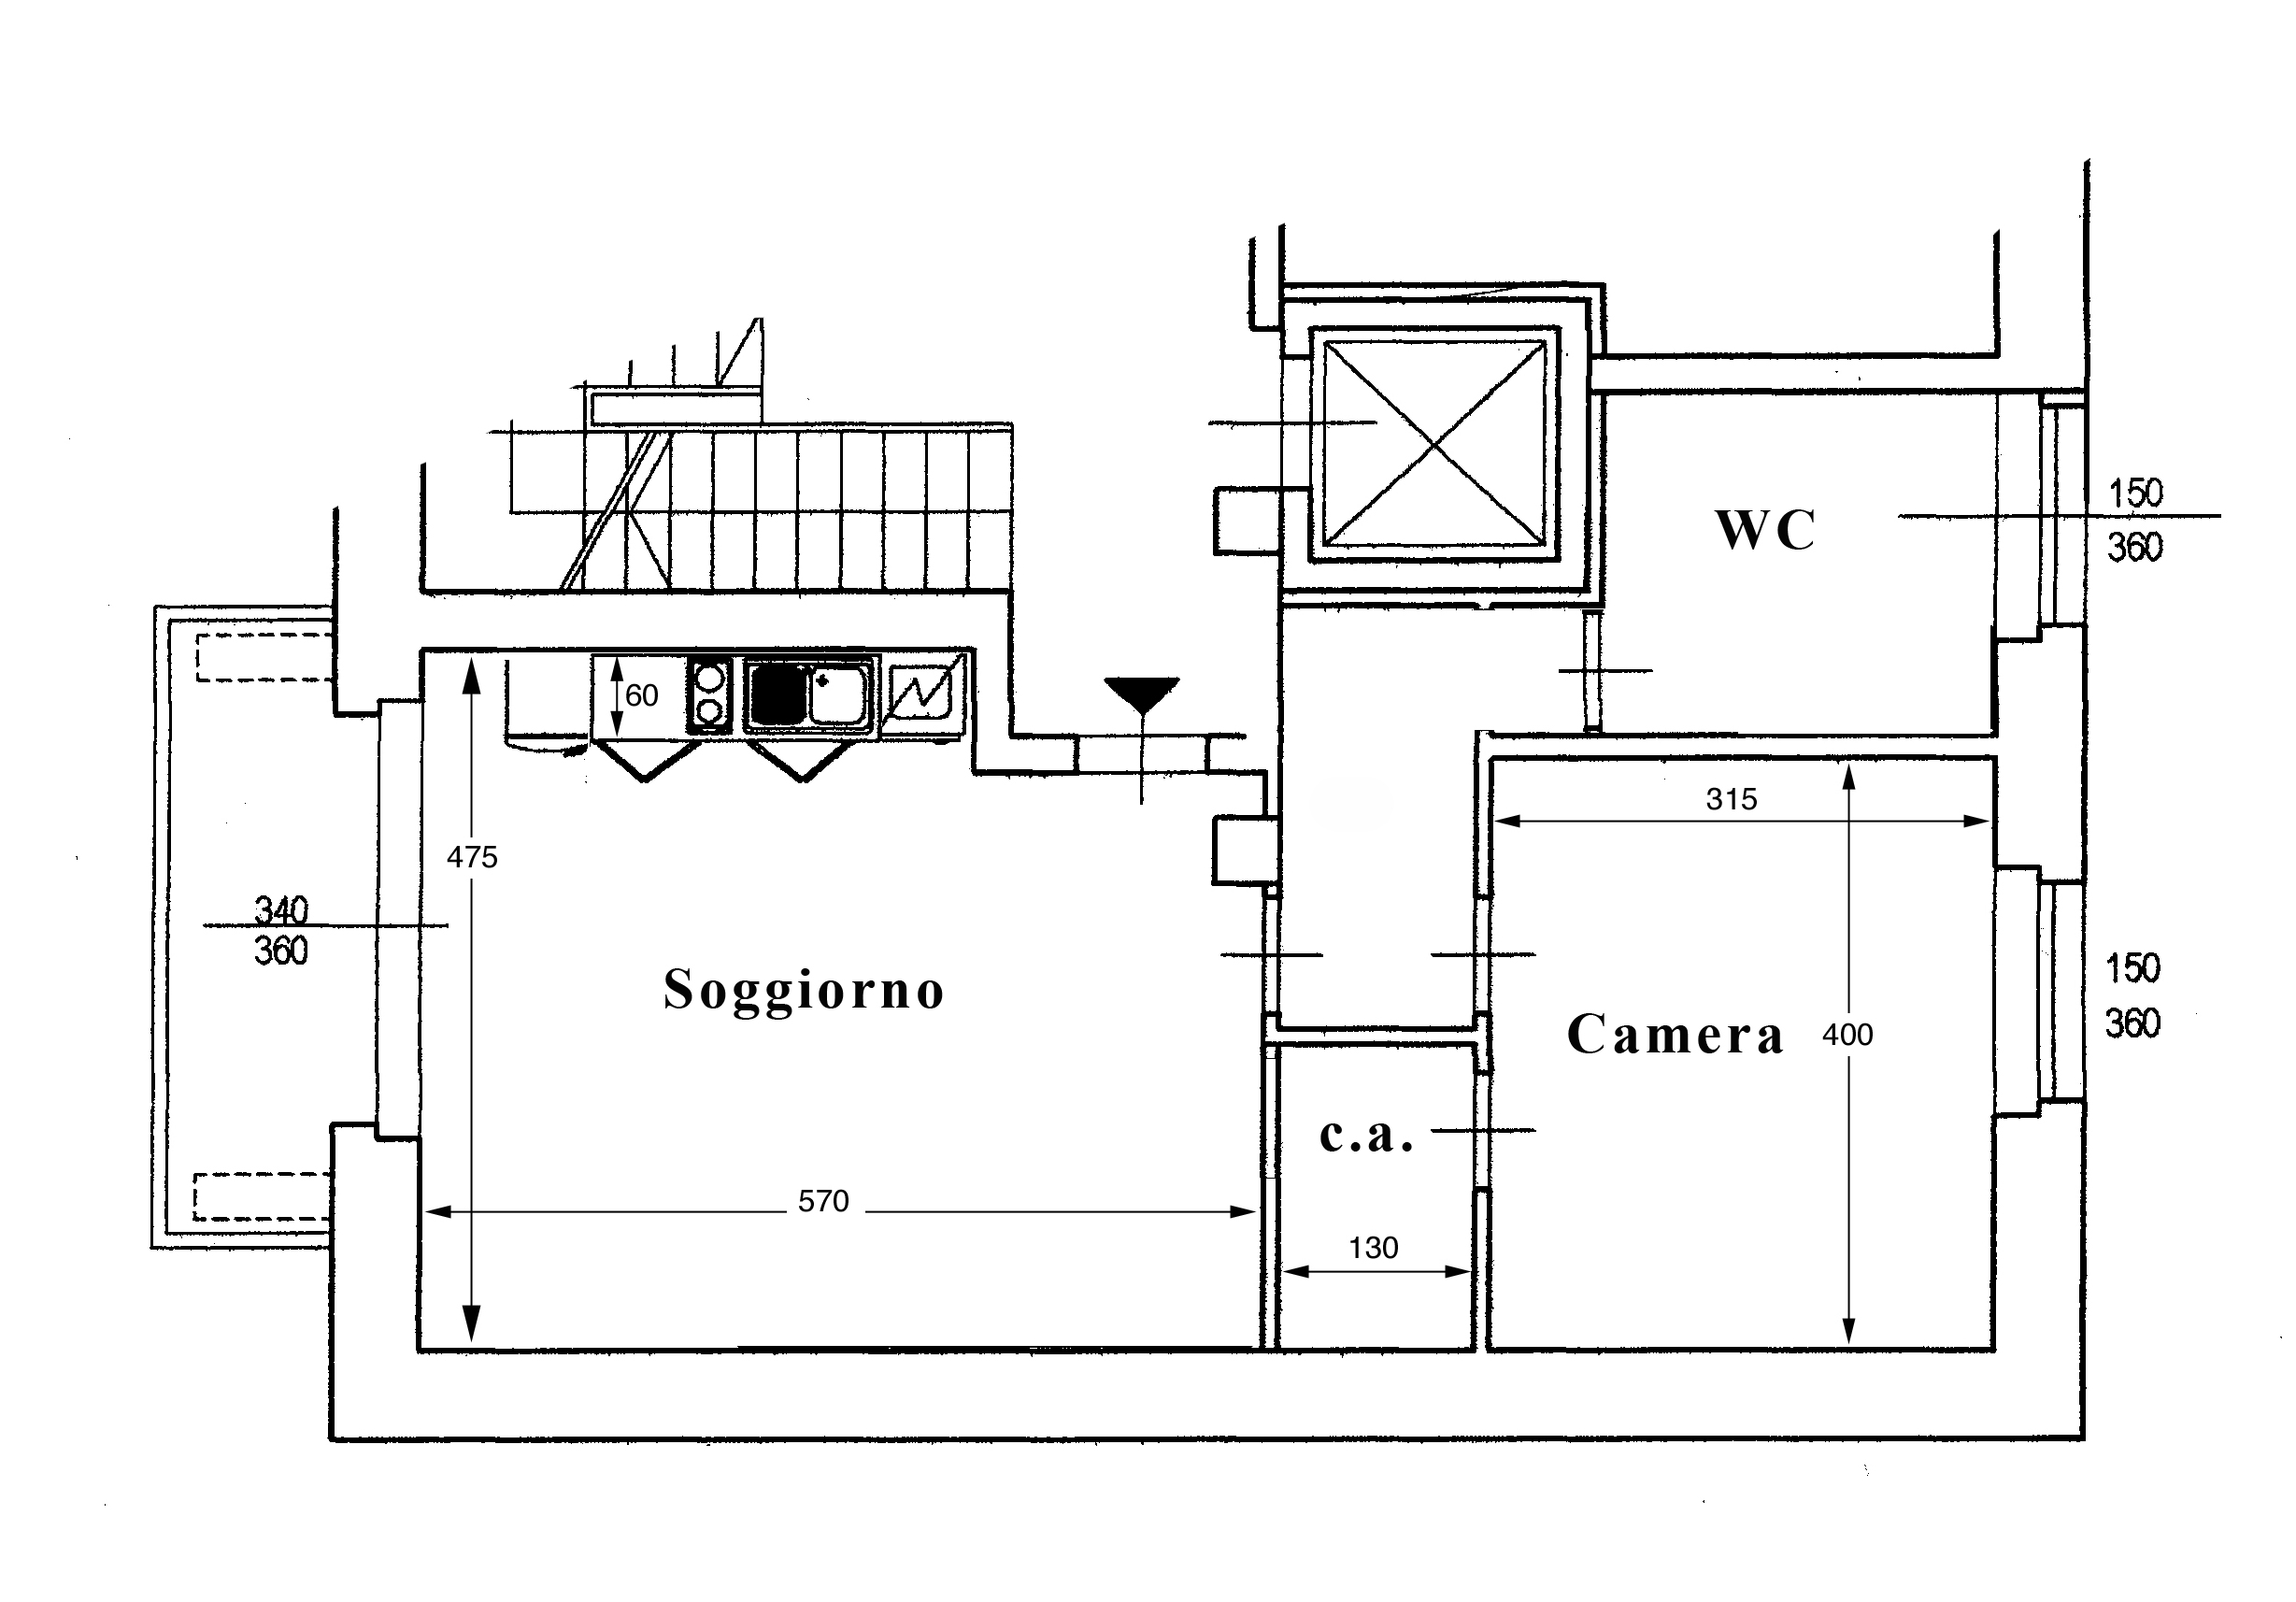 planimetrie/fPpixzxNDa.jpg